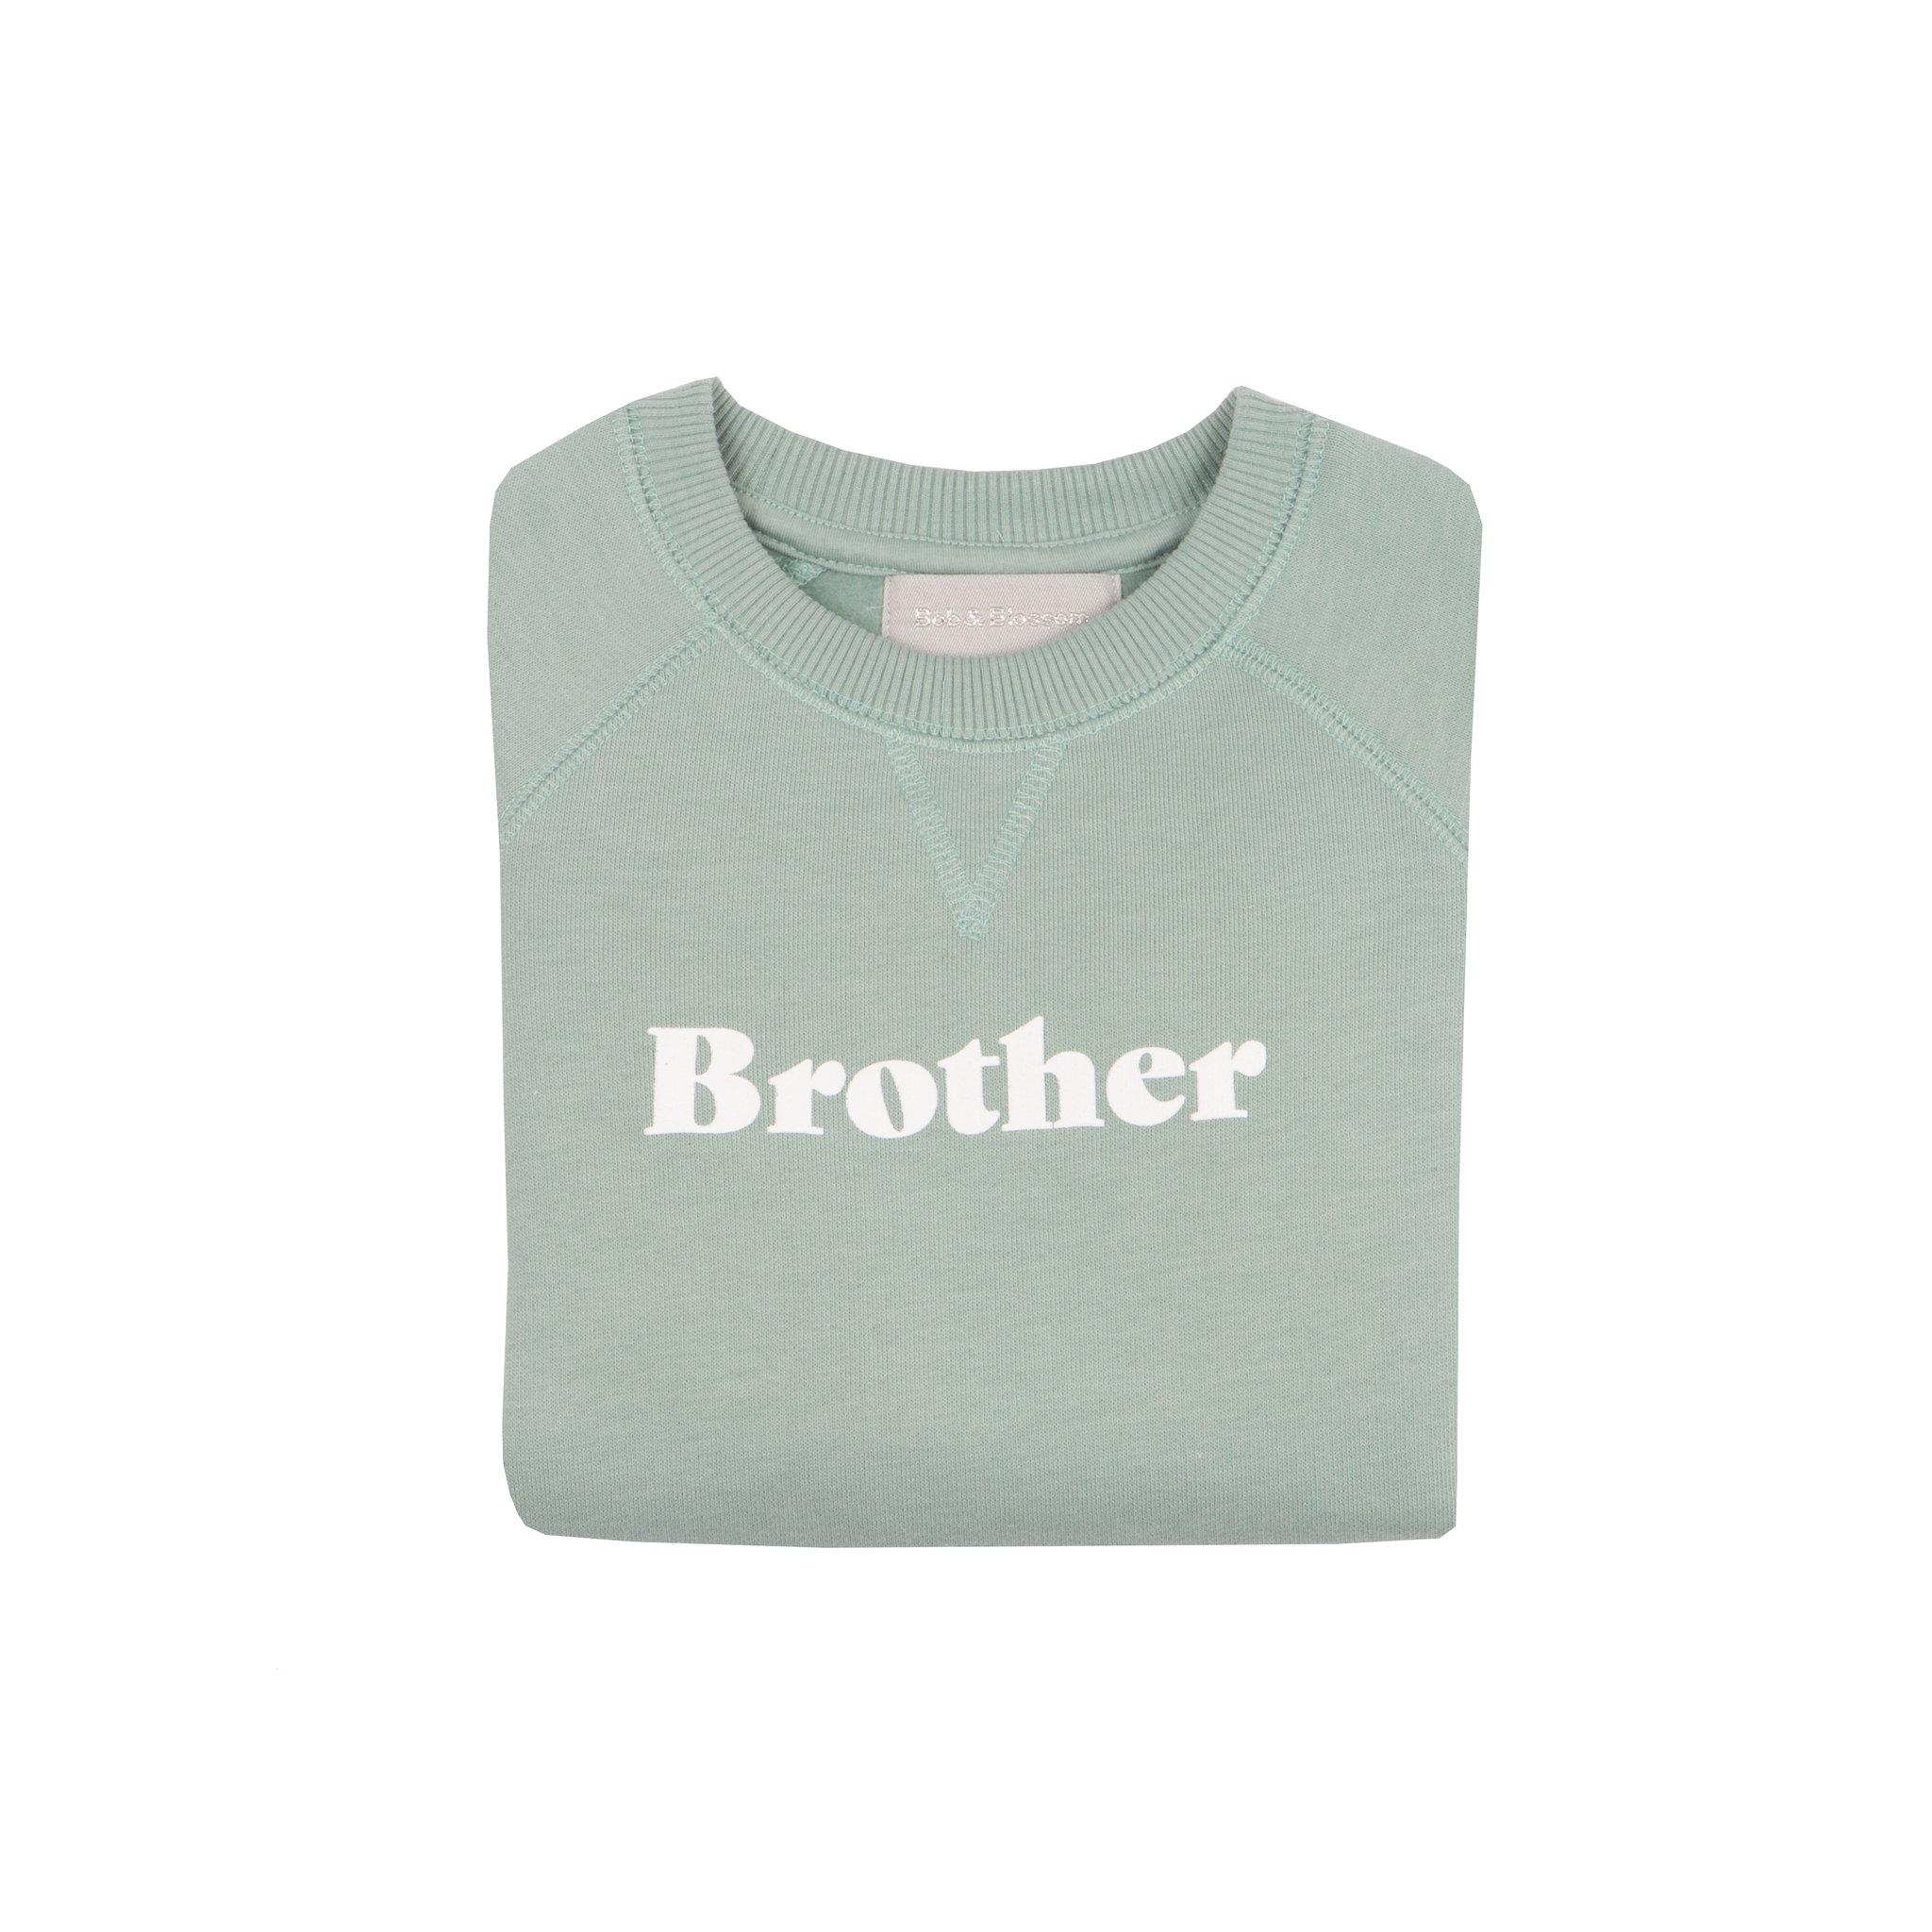 Bob & Blossom 'Brother' Sweatshirt - Sage